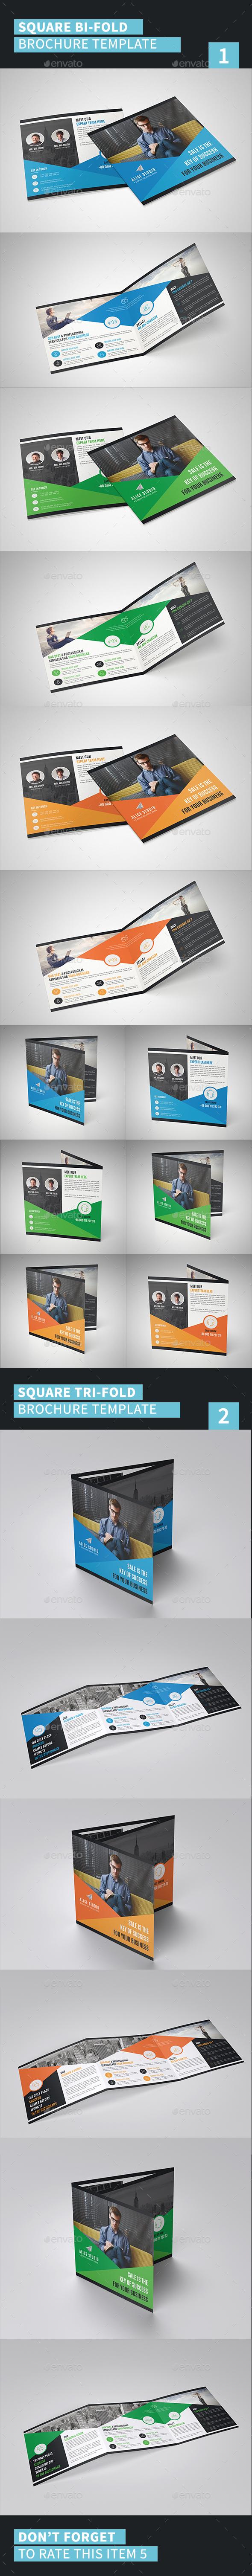 Square Brochure Bundle - Corporate Brochures